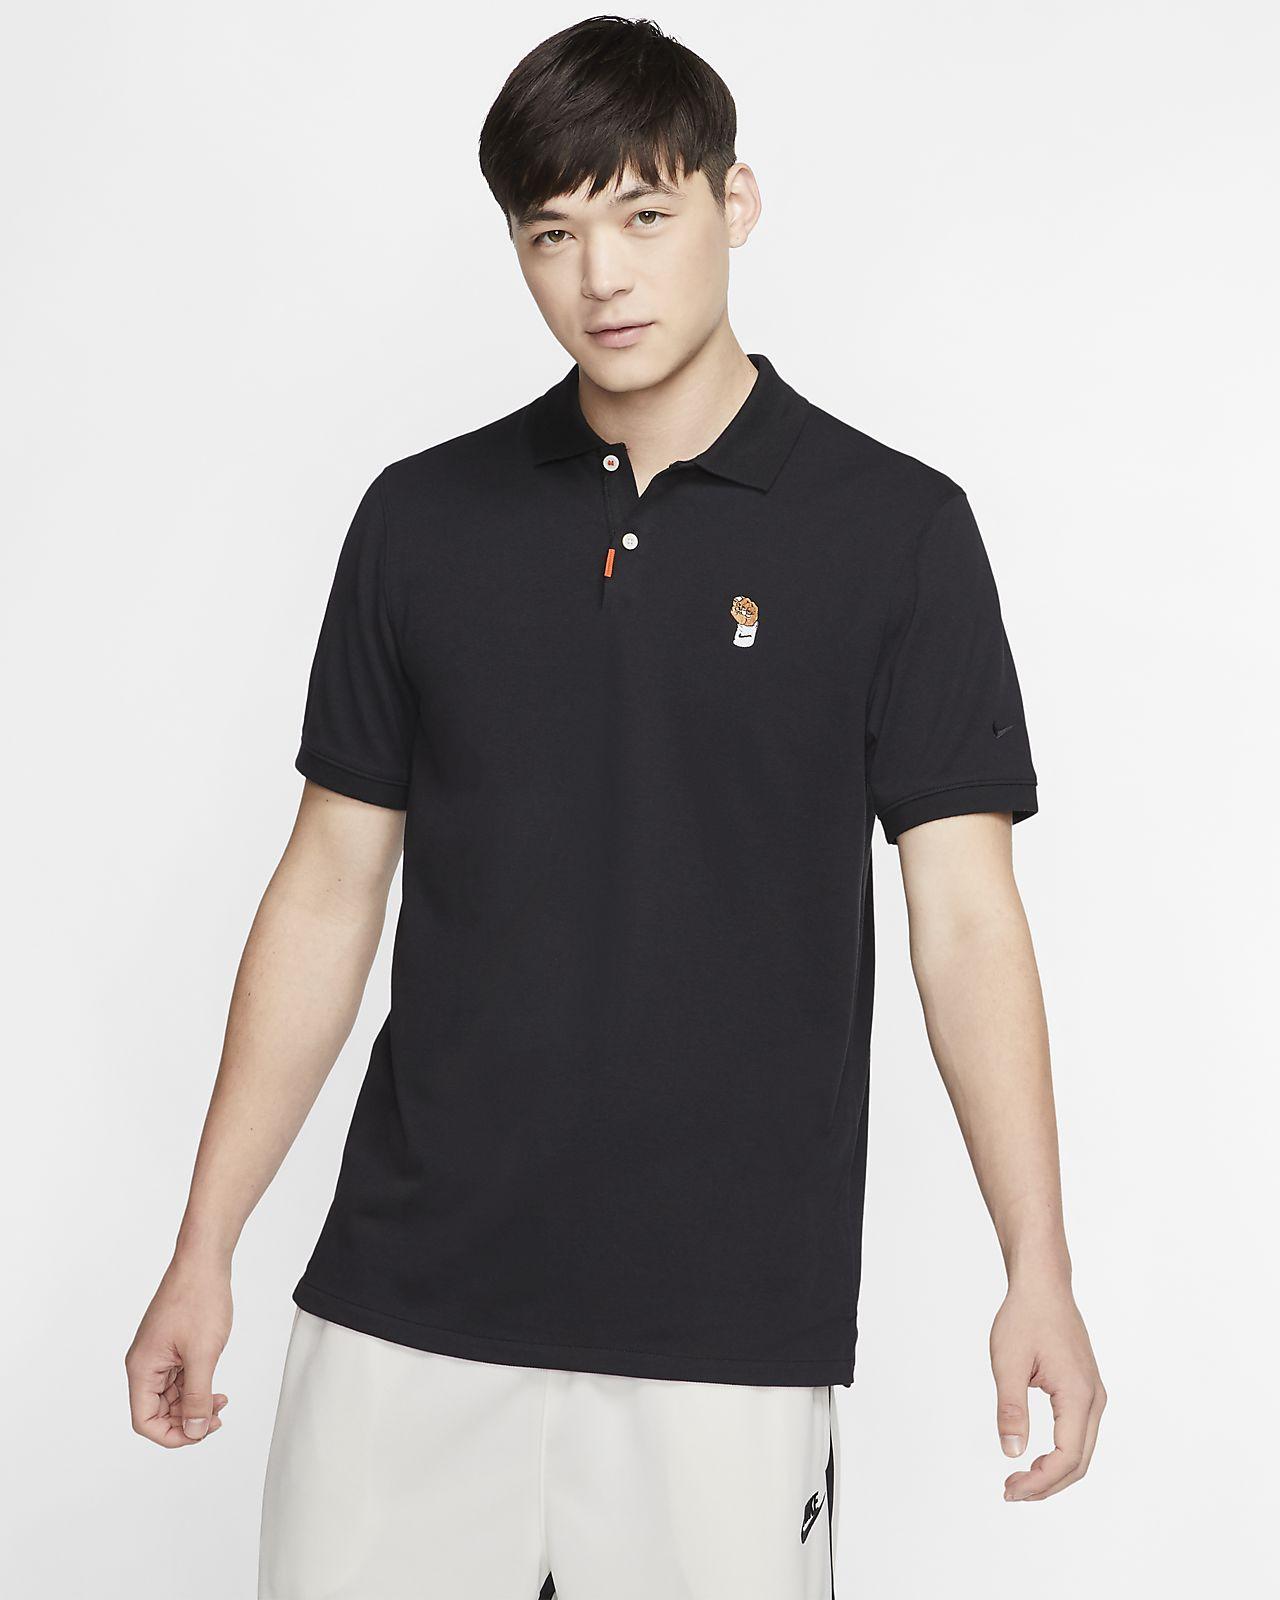 Nike Polo ¡Vamos Rafa! Unisex poloskjorte med smal passform